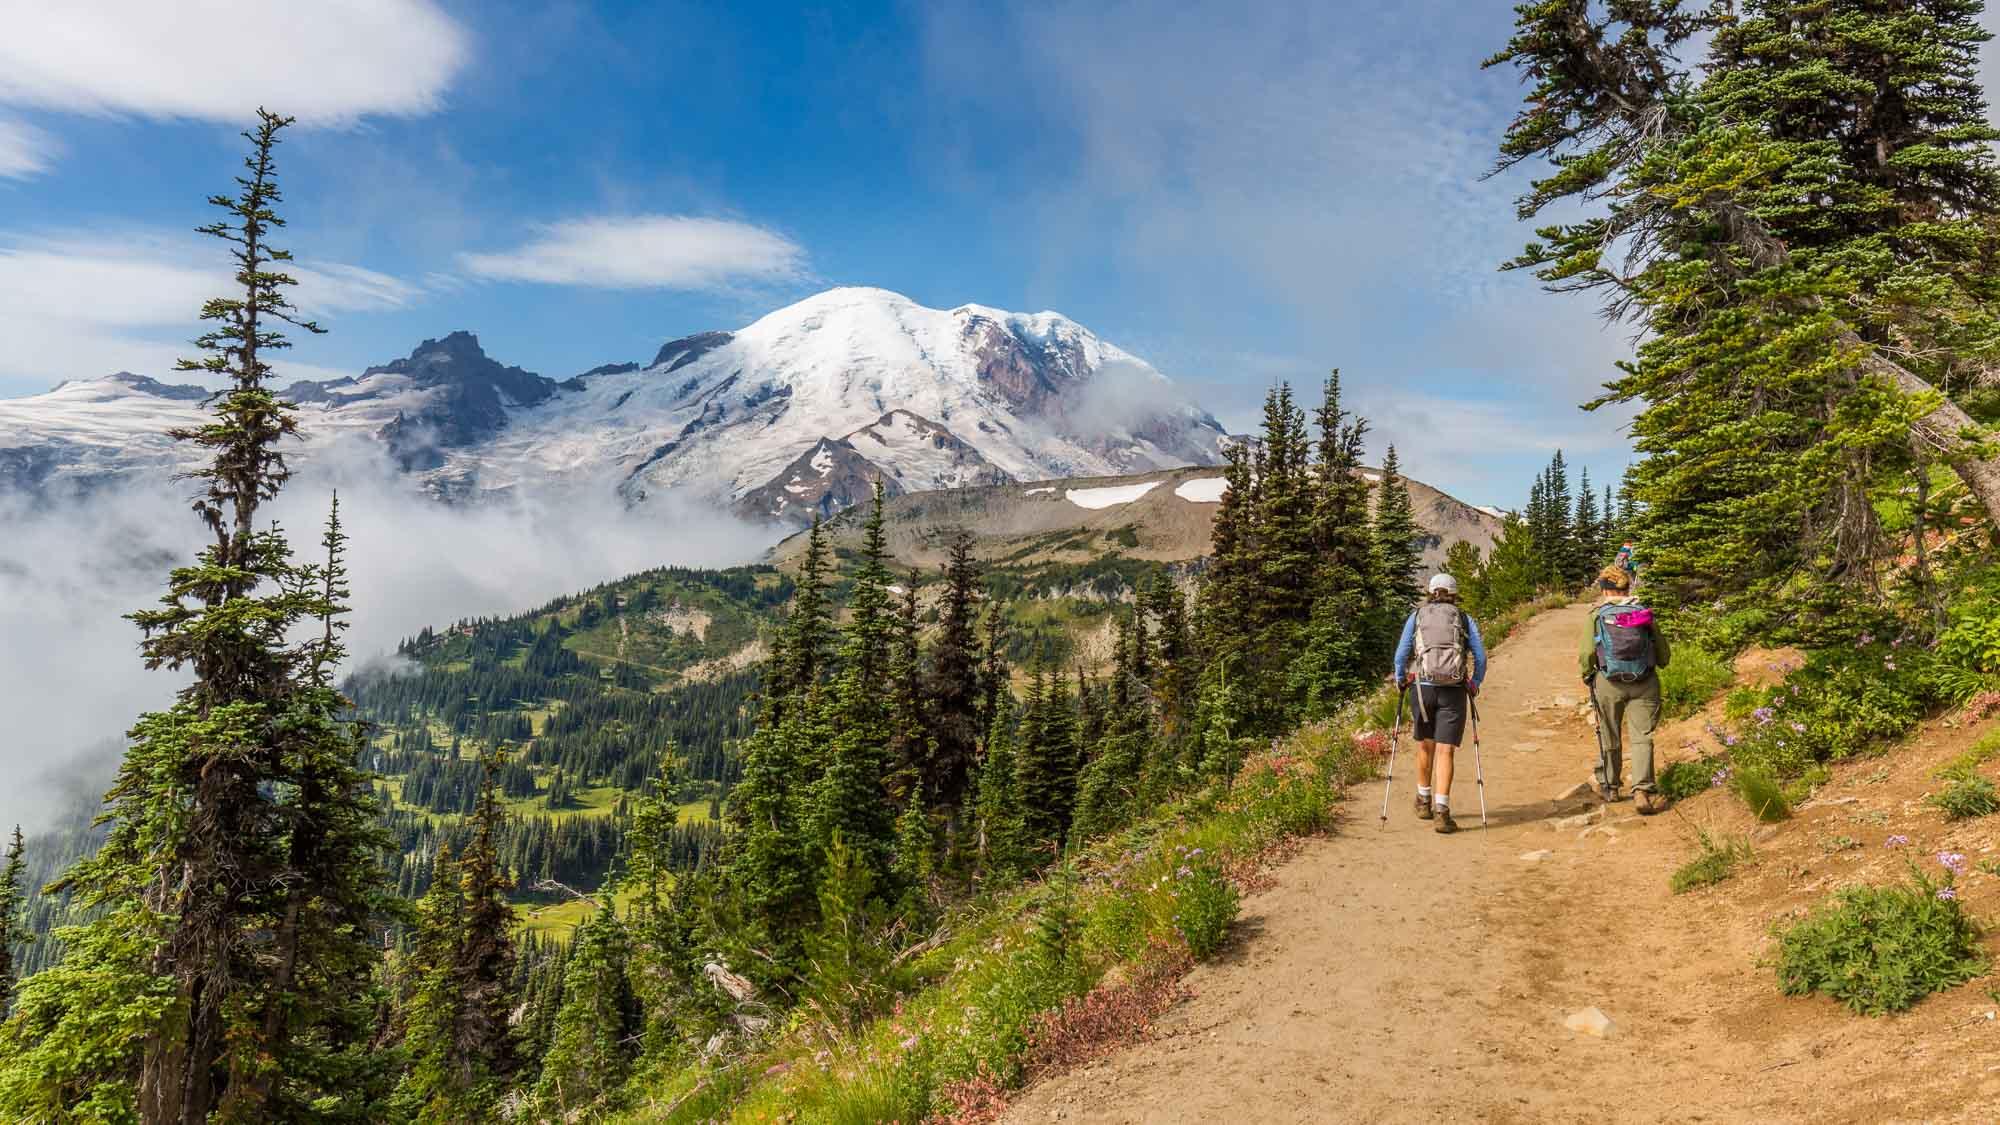 Mount Rainier hiking on the Wonderland Trail, Washington